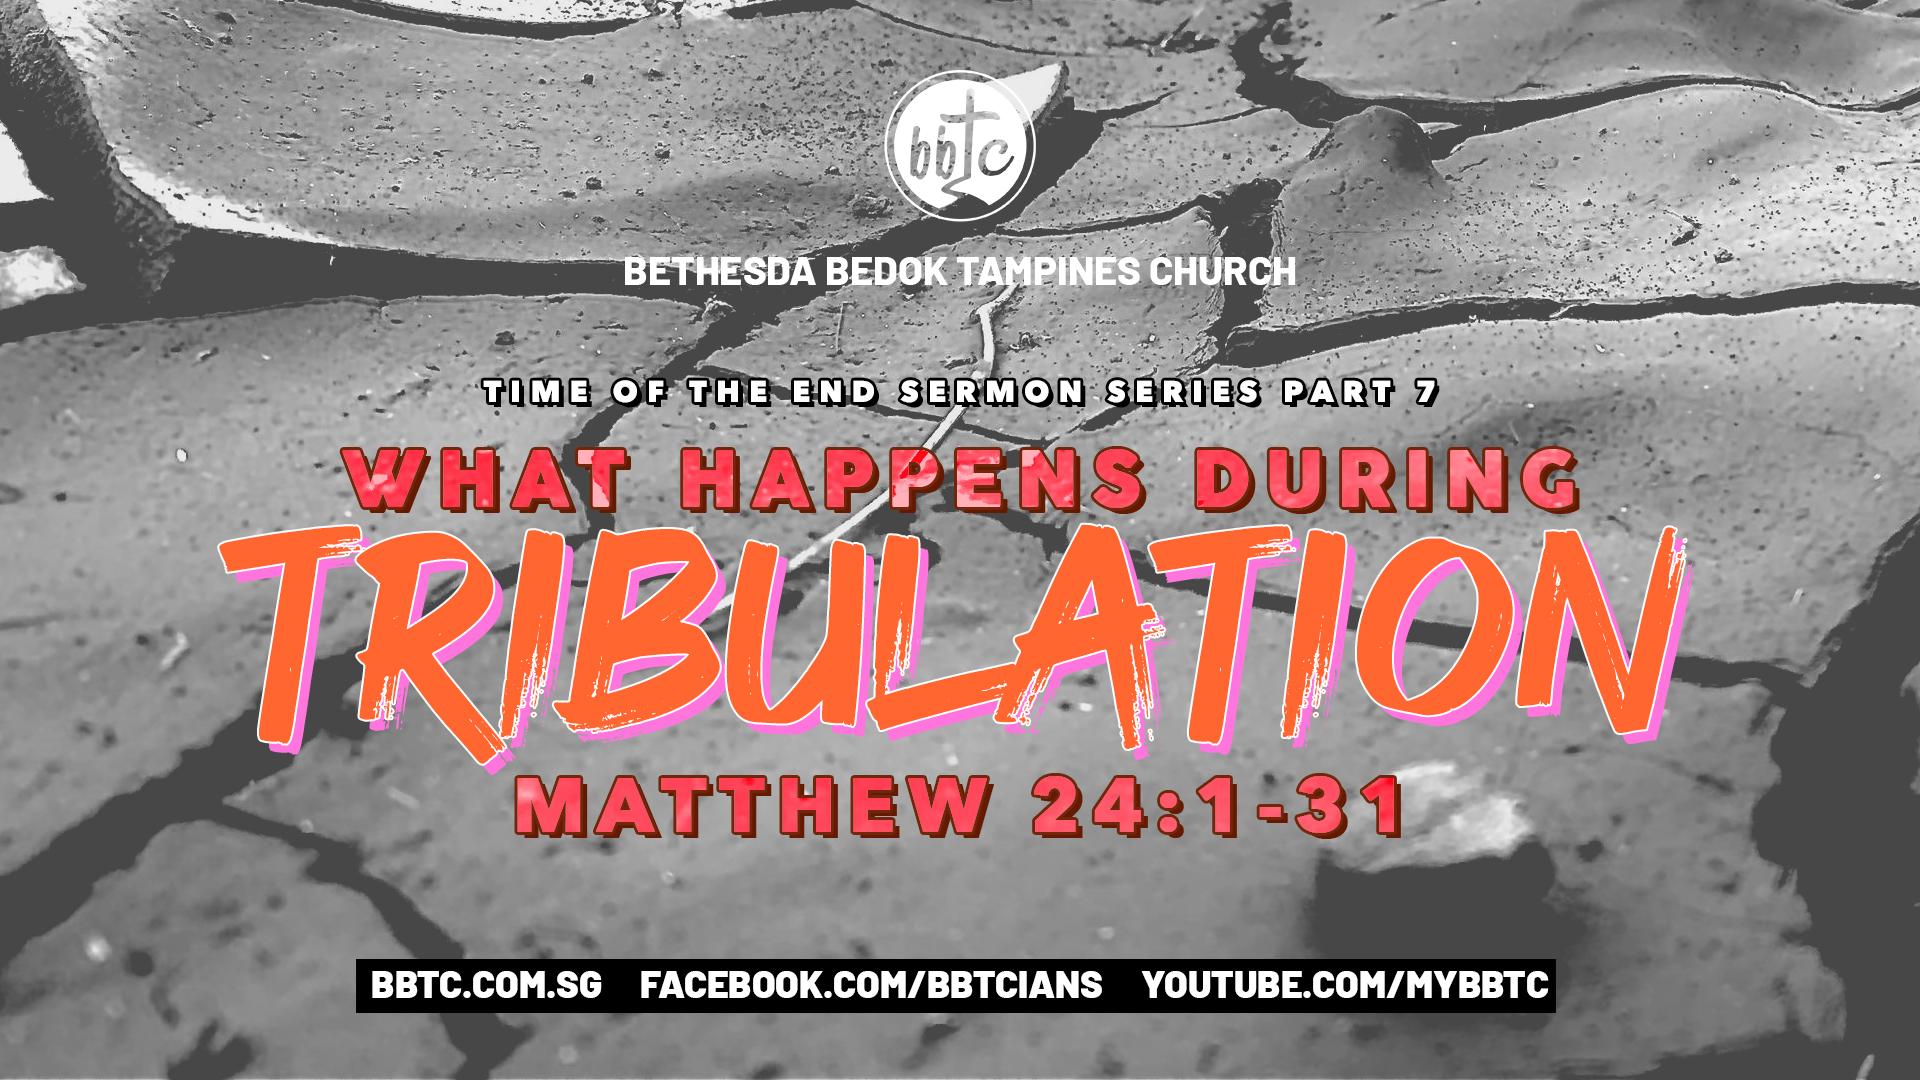 WHAT HAPPENS DURING TRIBULATION